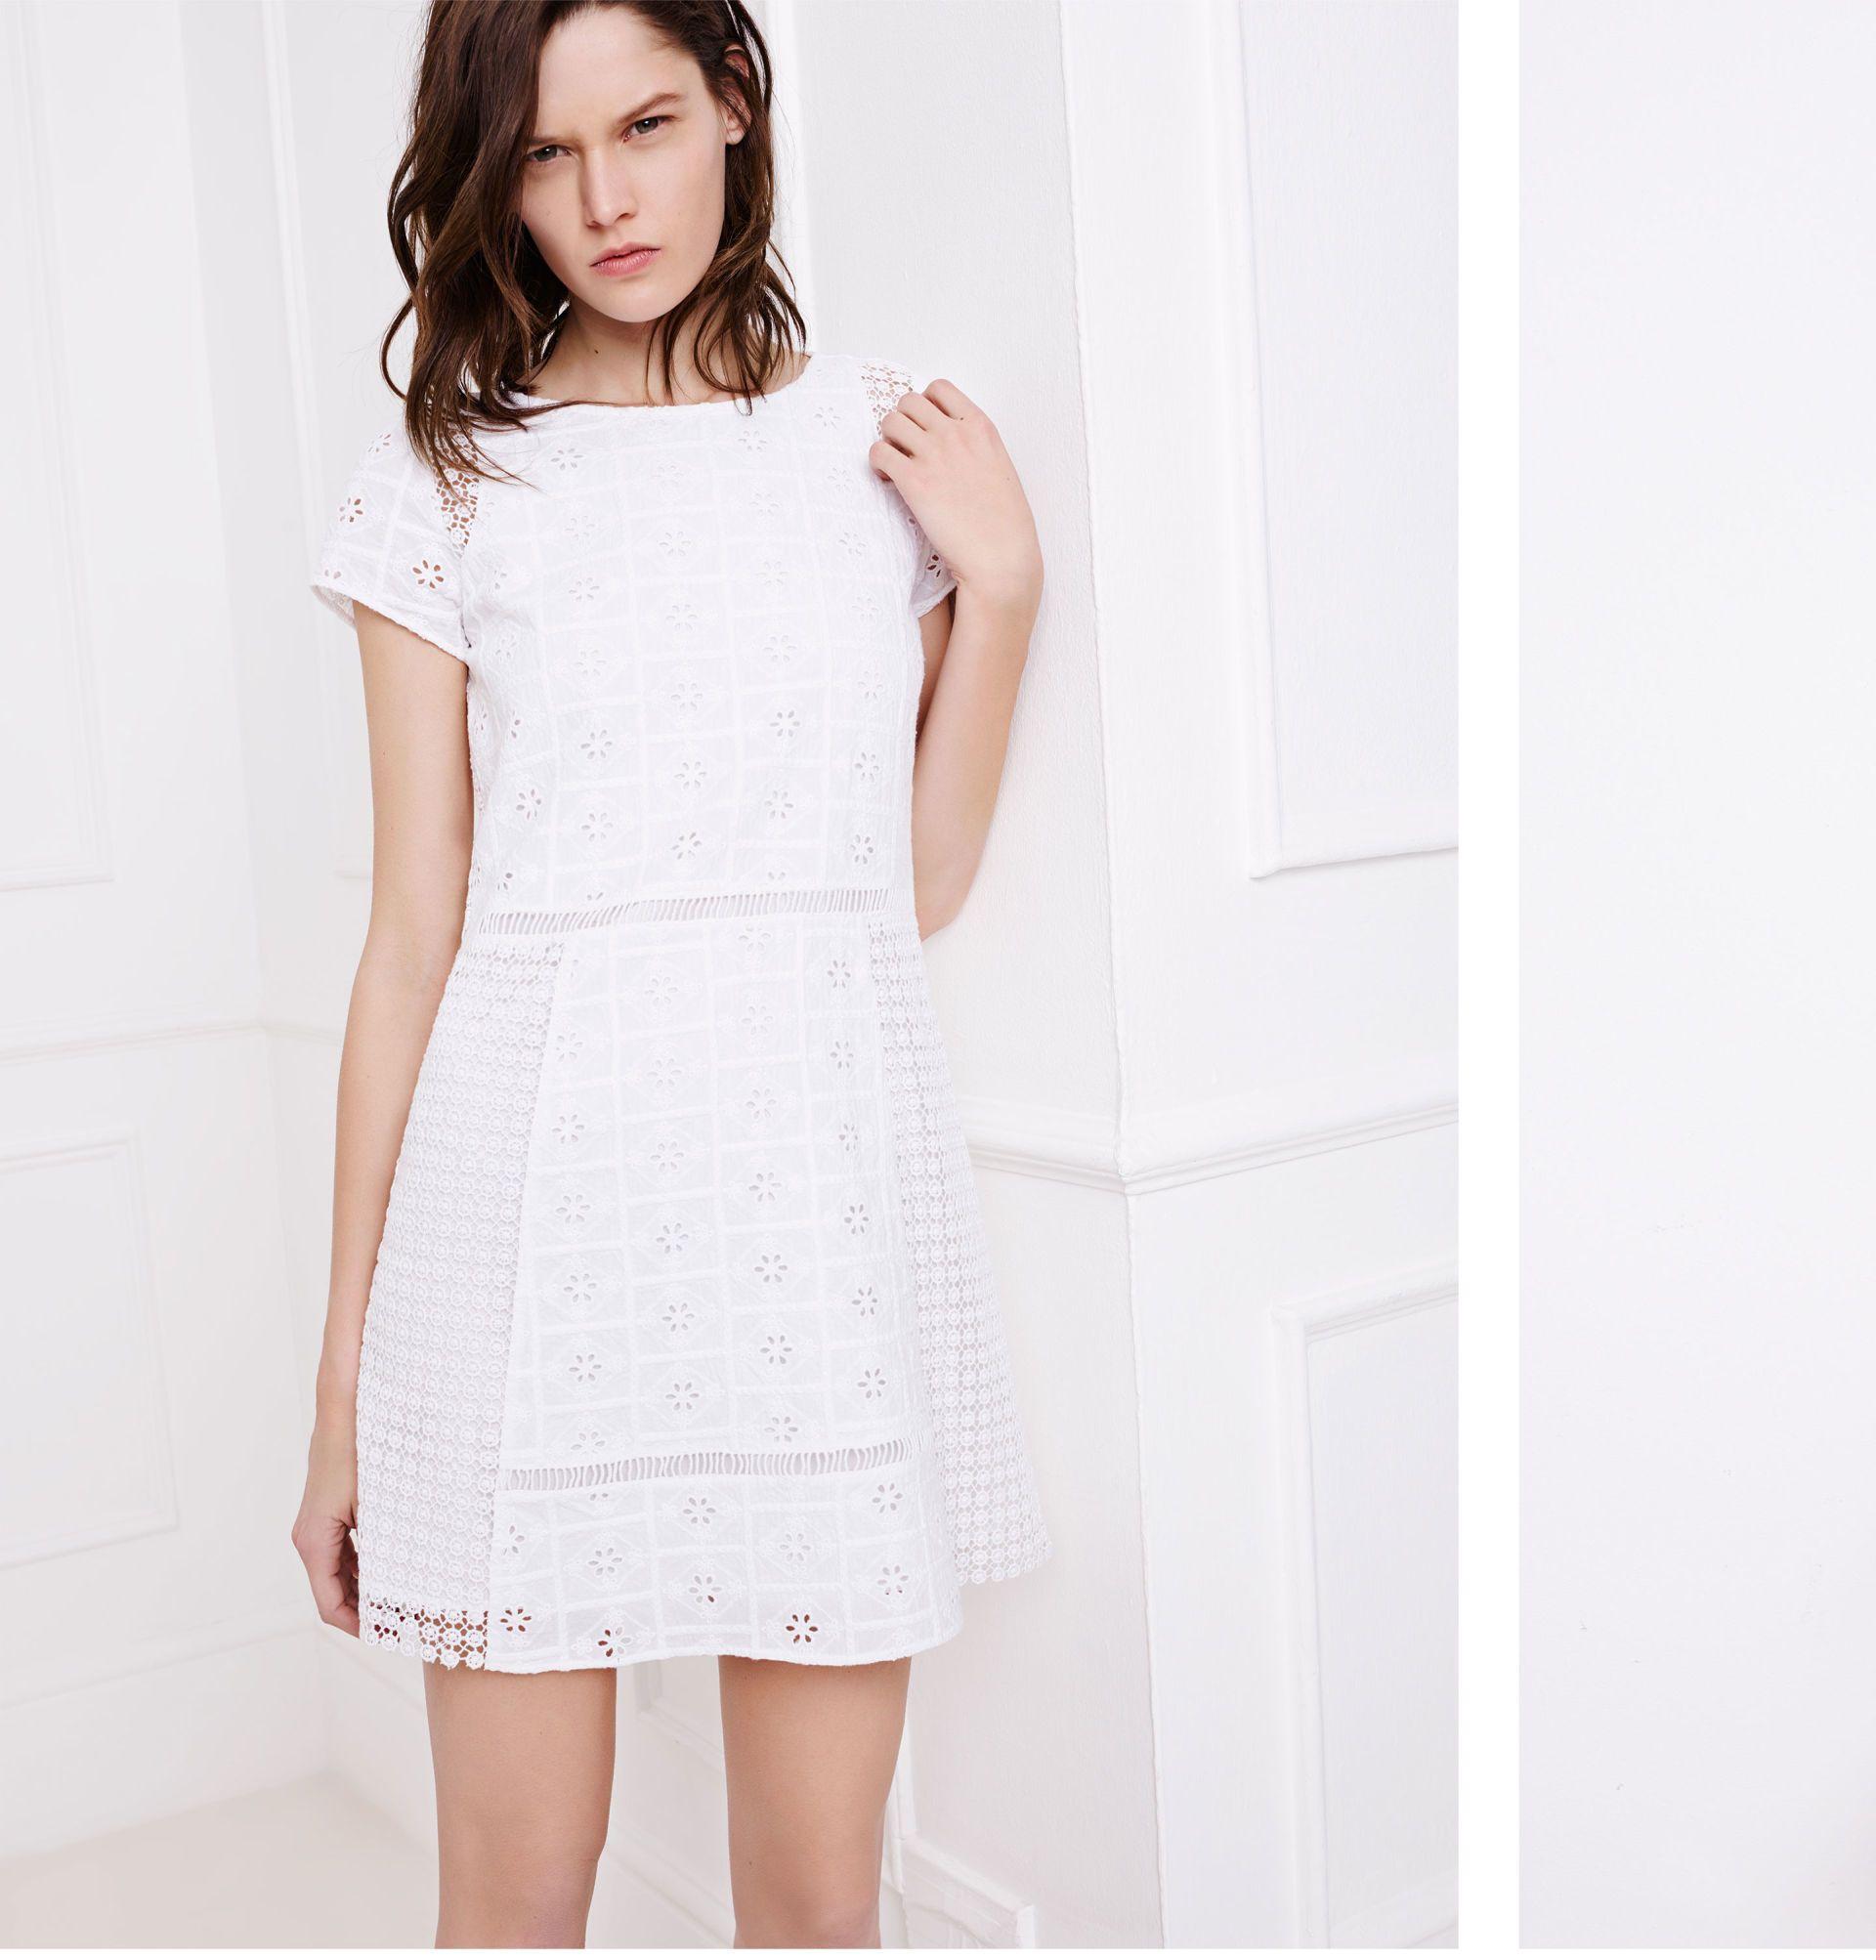 Moda vestido blanco 2015